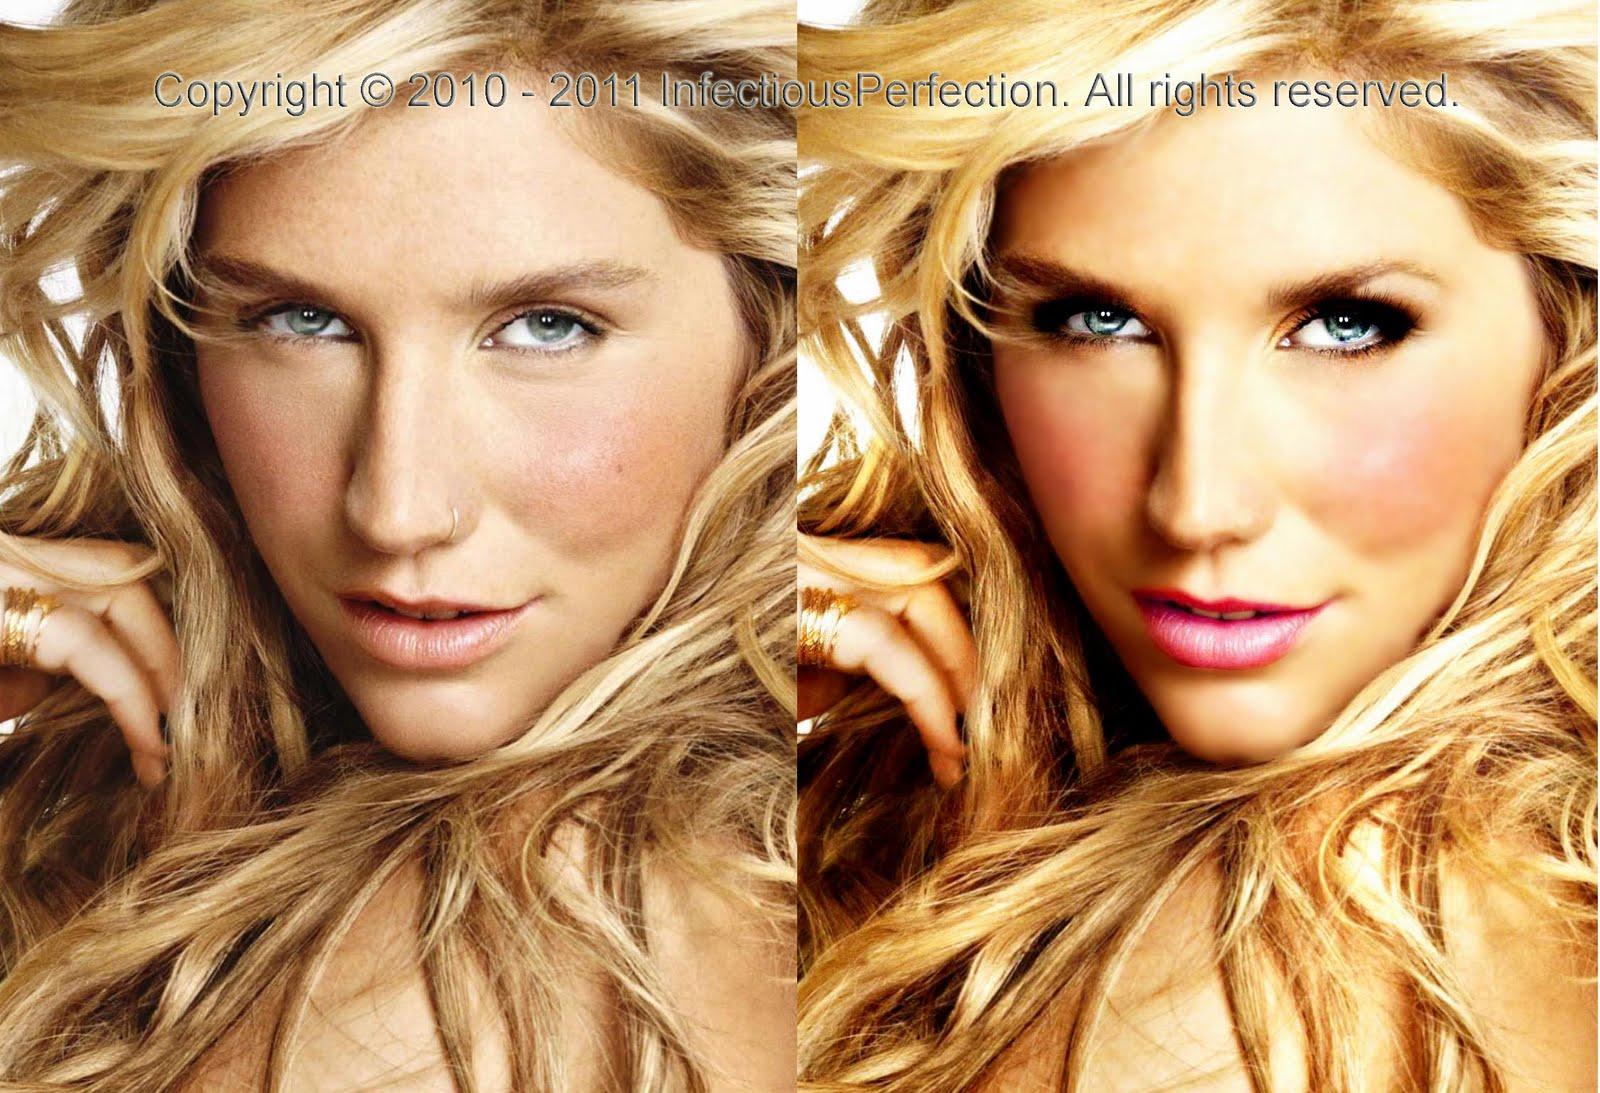 http://3.bp.blogspot.com/--KeyiMp_Wds/TbT78dQZkRI/AAAAAAAAABc/xDzbTwHewas/s1600/Kesha.jpg